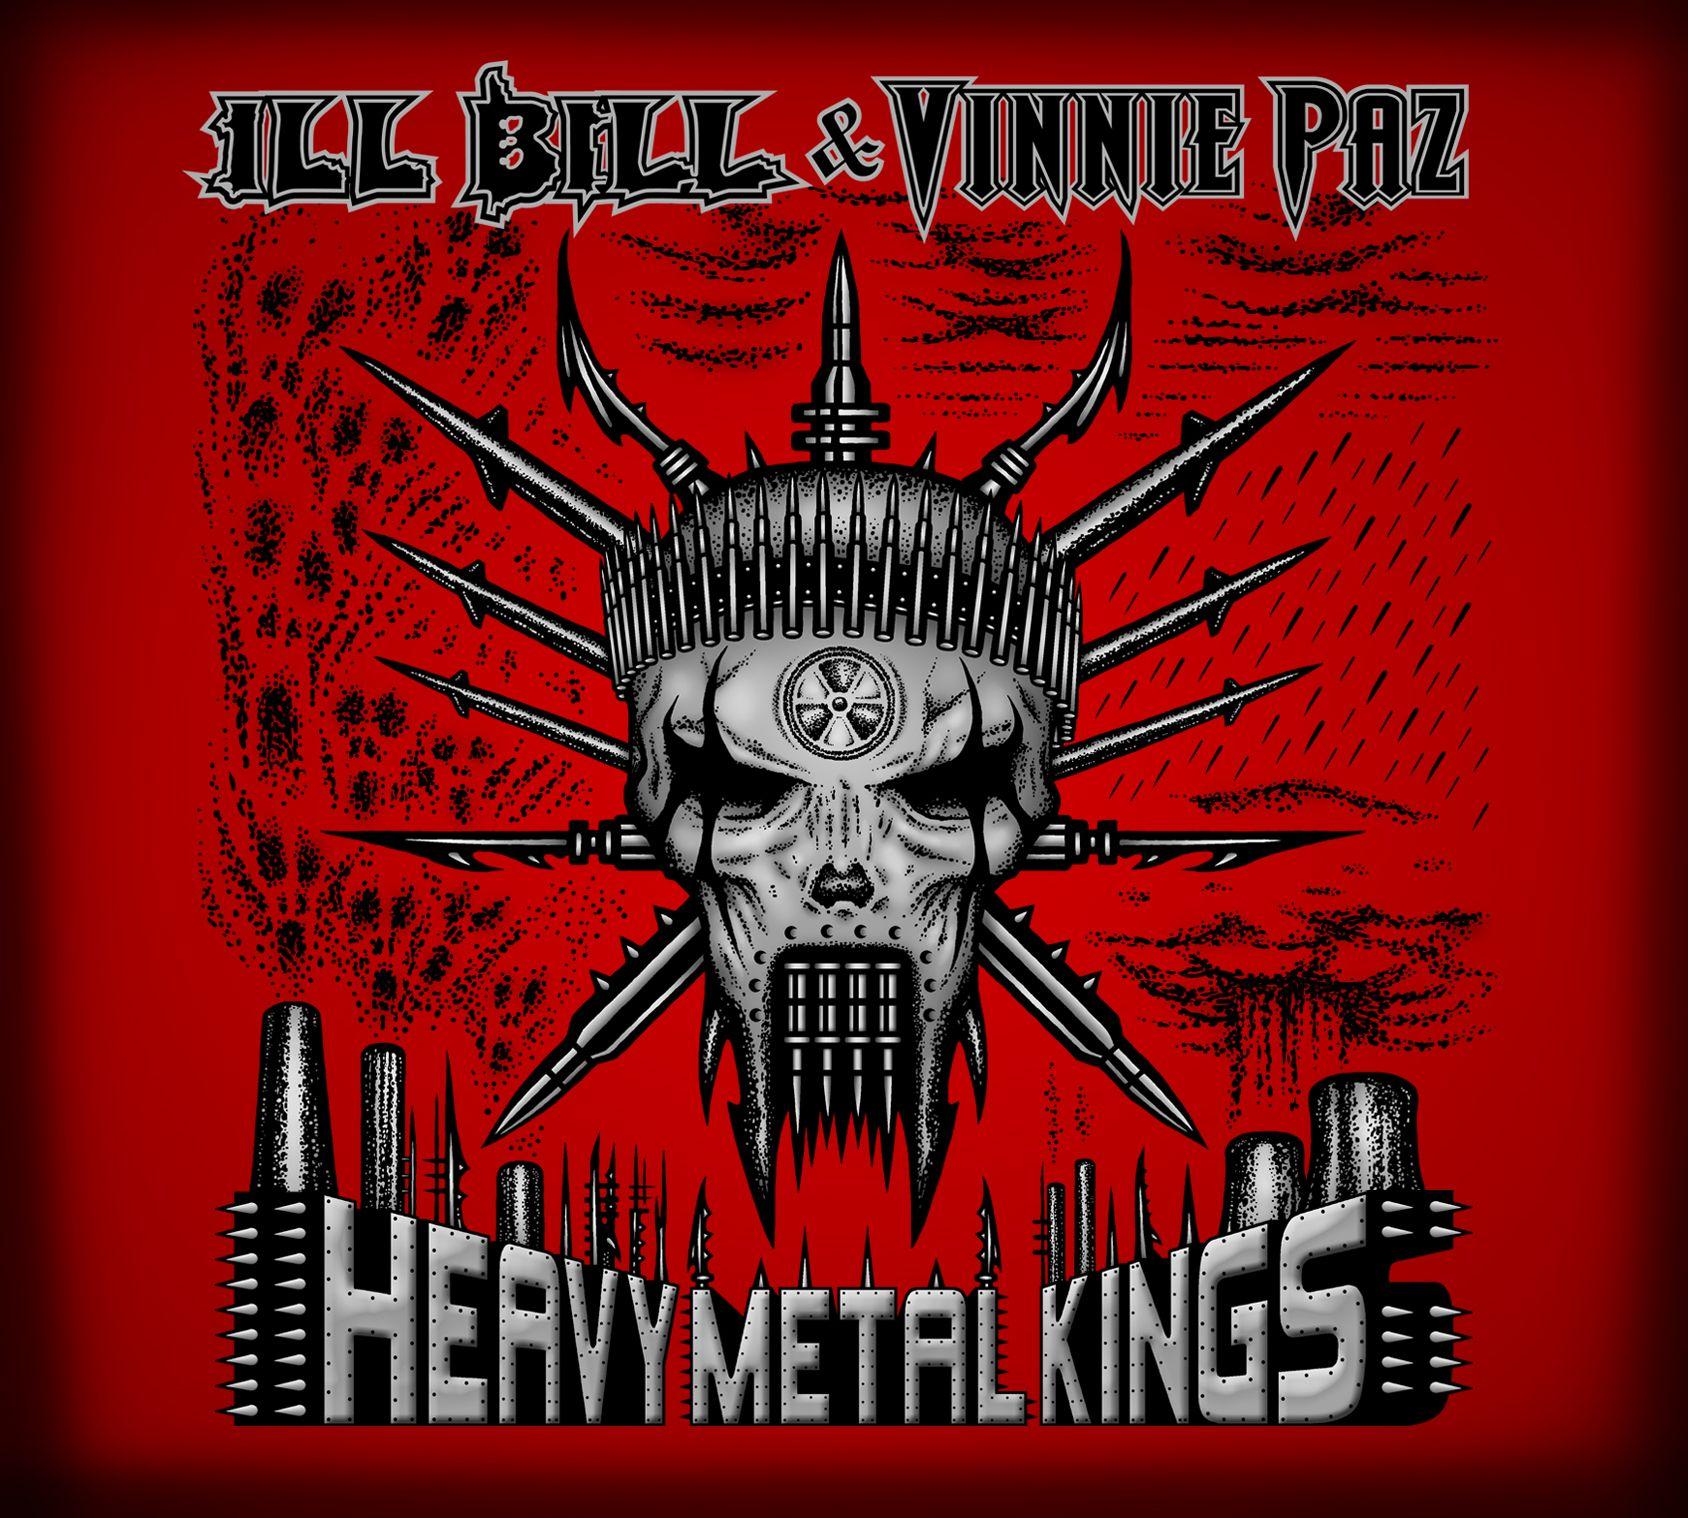 Heavy Metal Kings Vinnie Paz Heavy Metal King Diamond